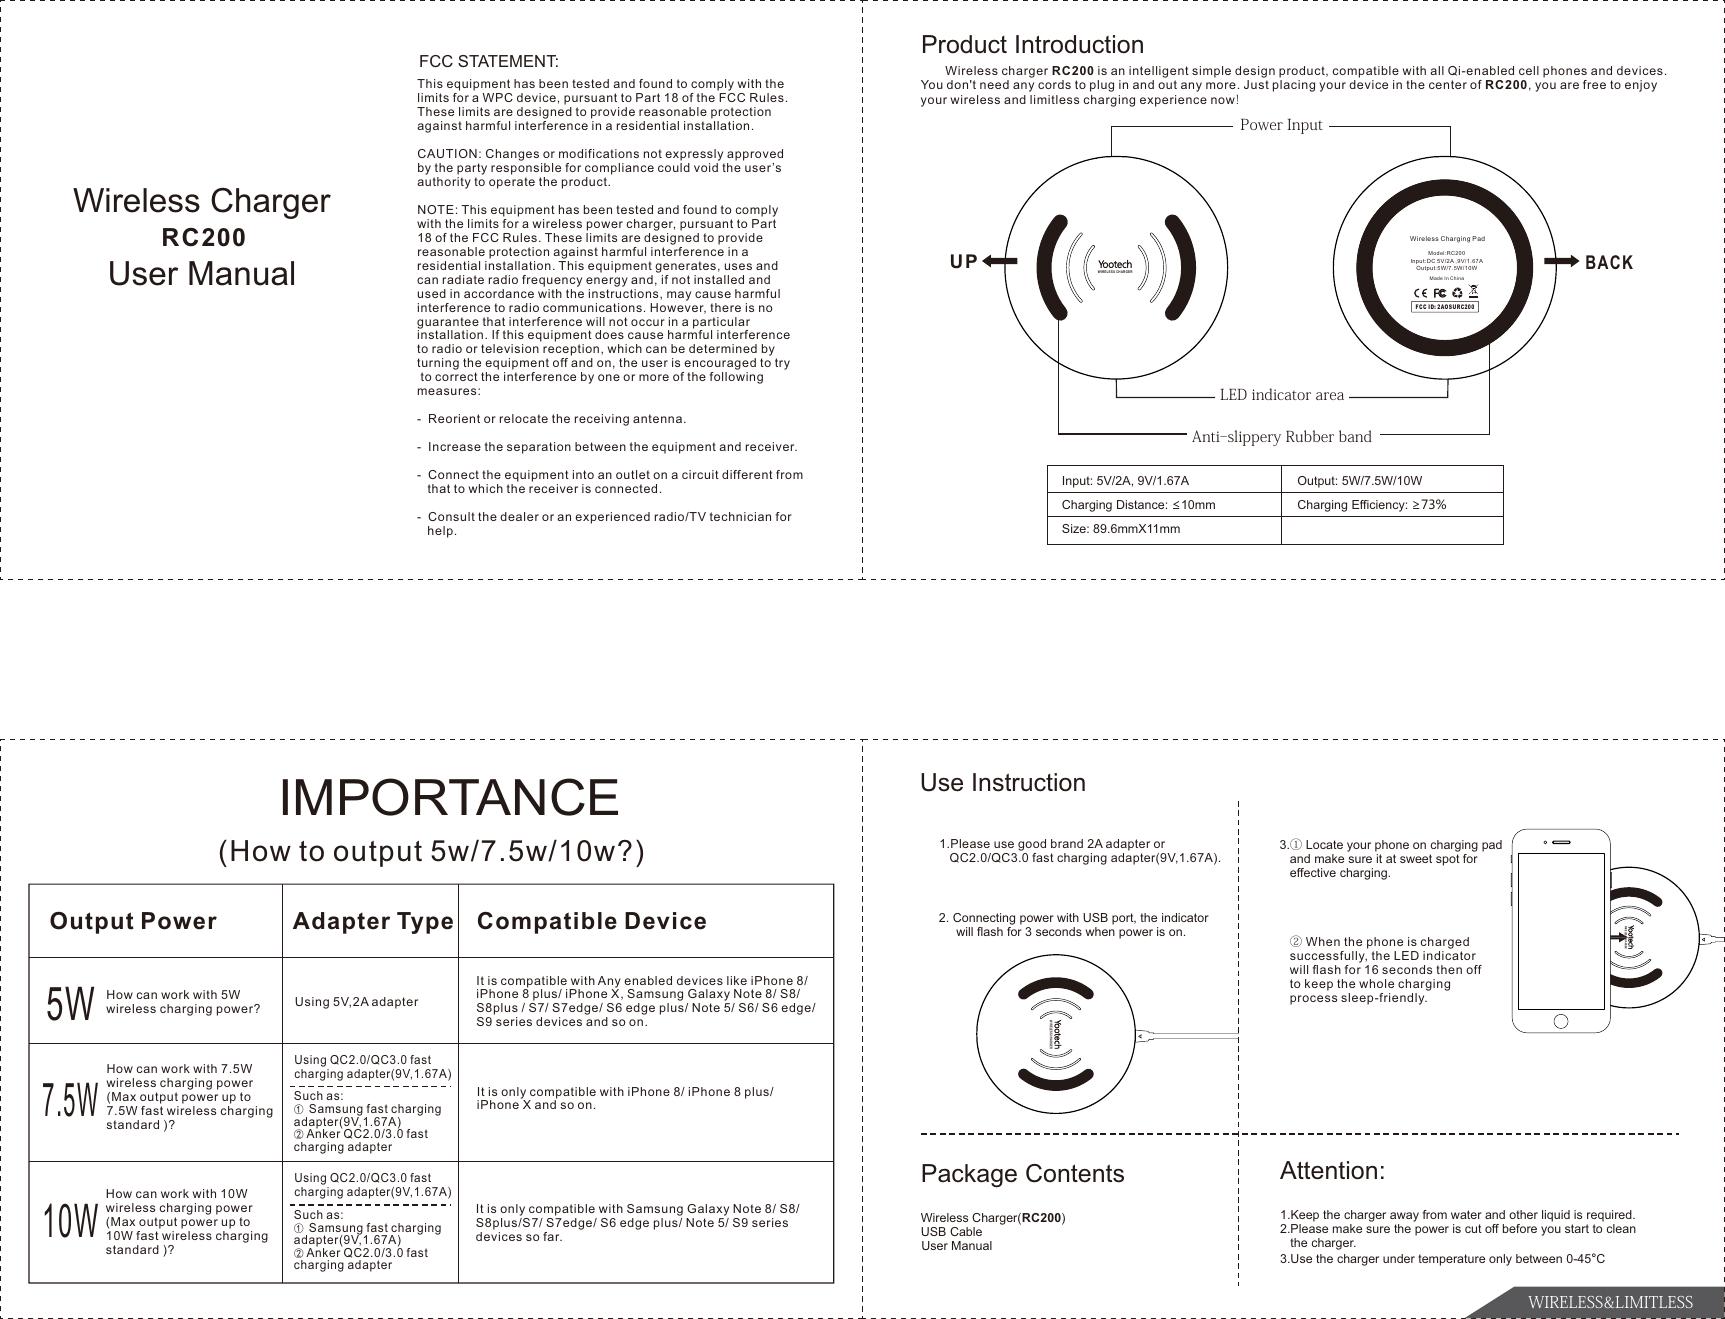 Shenzhen Kaixinghui Technology Rc200 Wireless Charger User Manual 1 Temperatureindicatorcircuitjpg